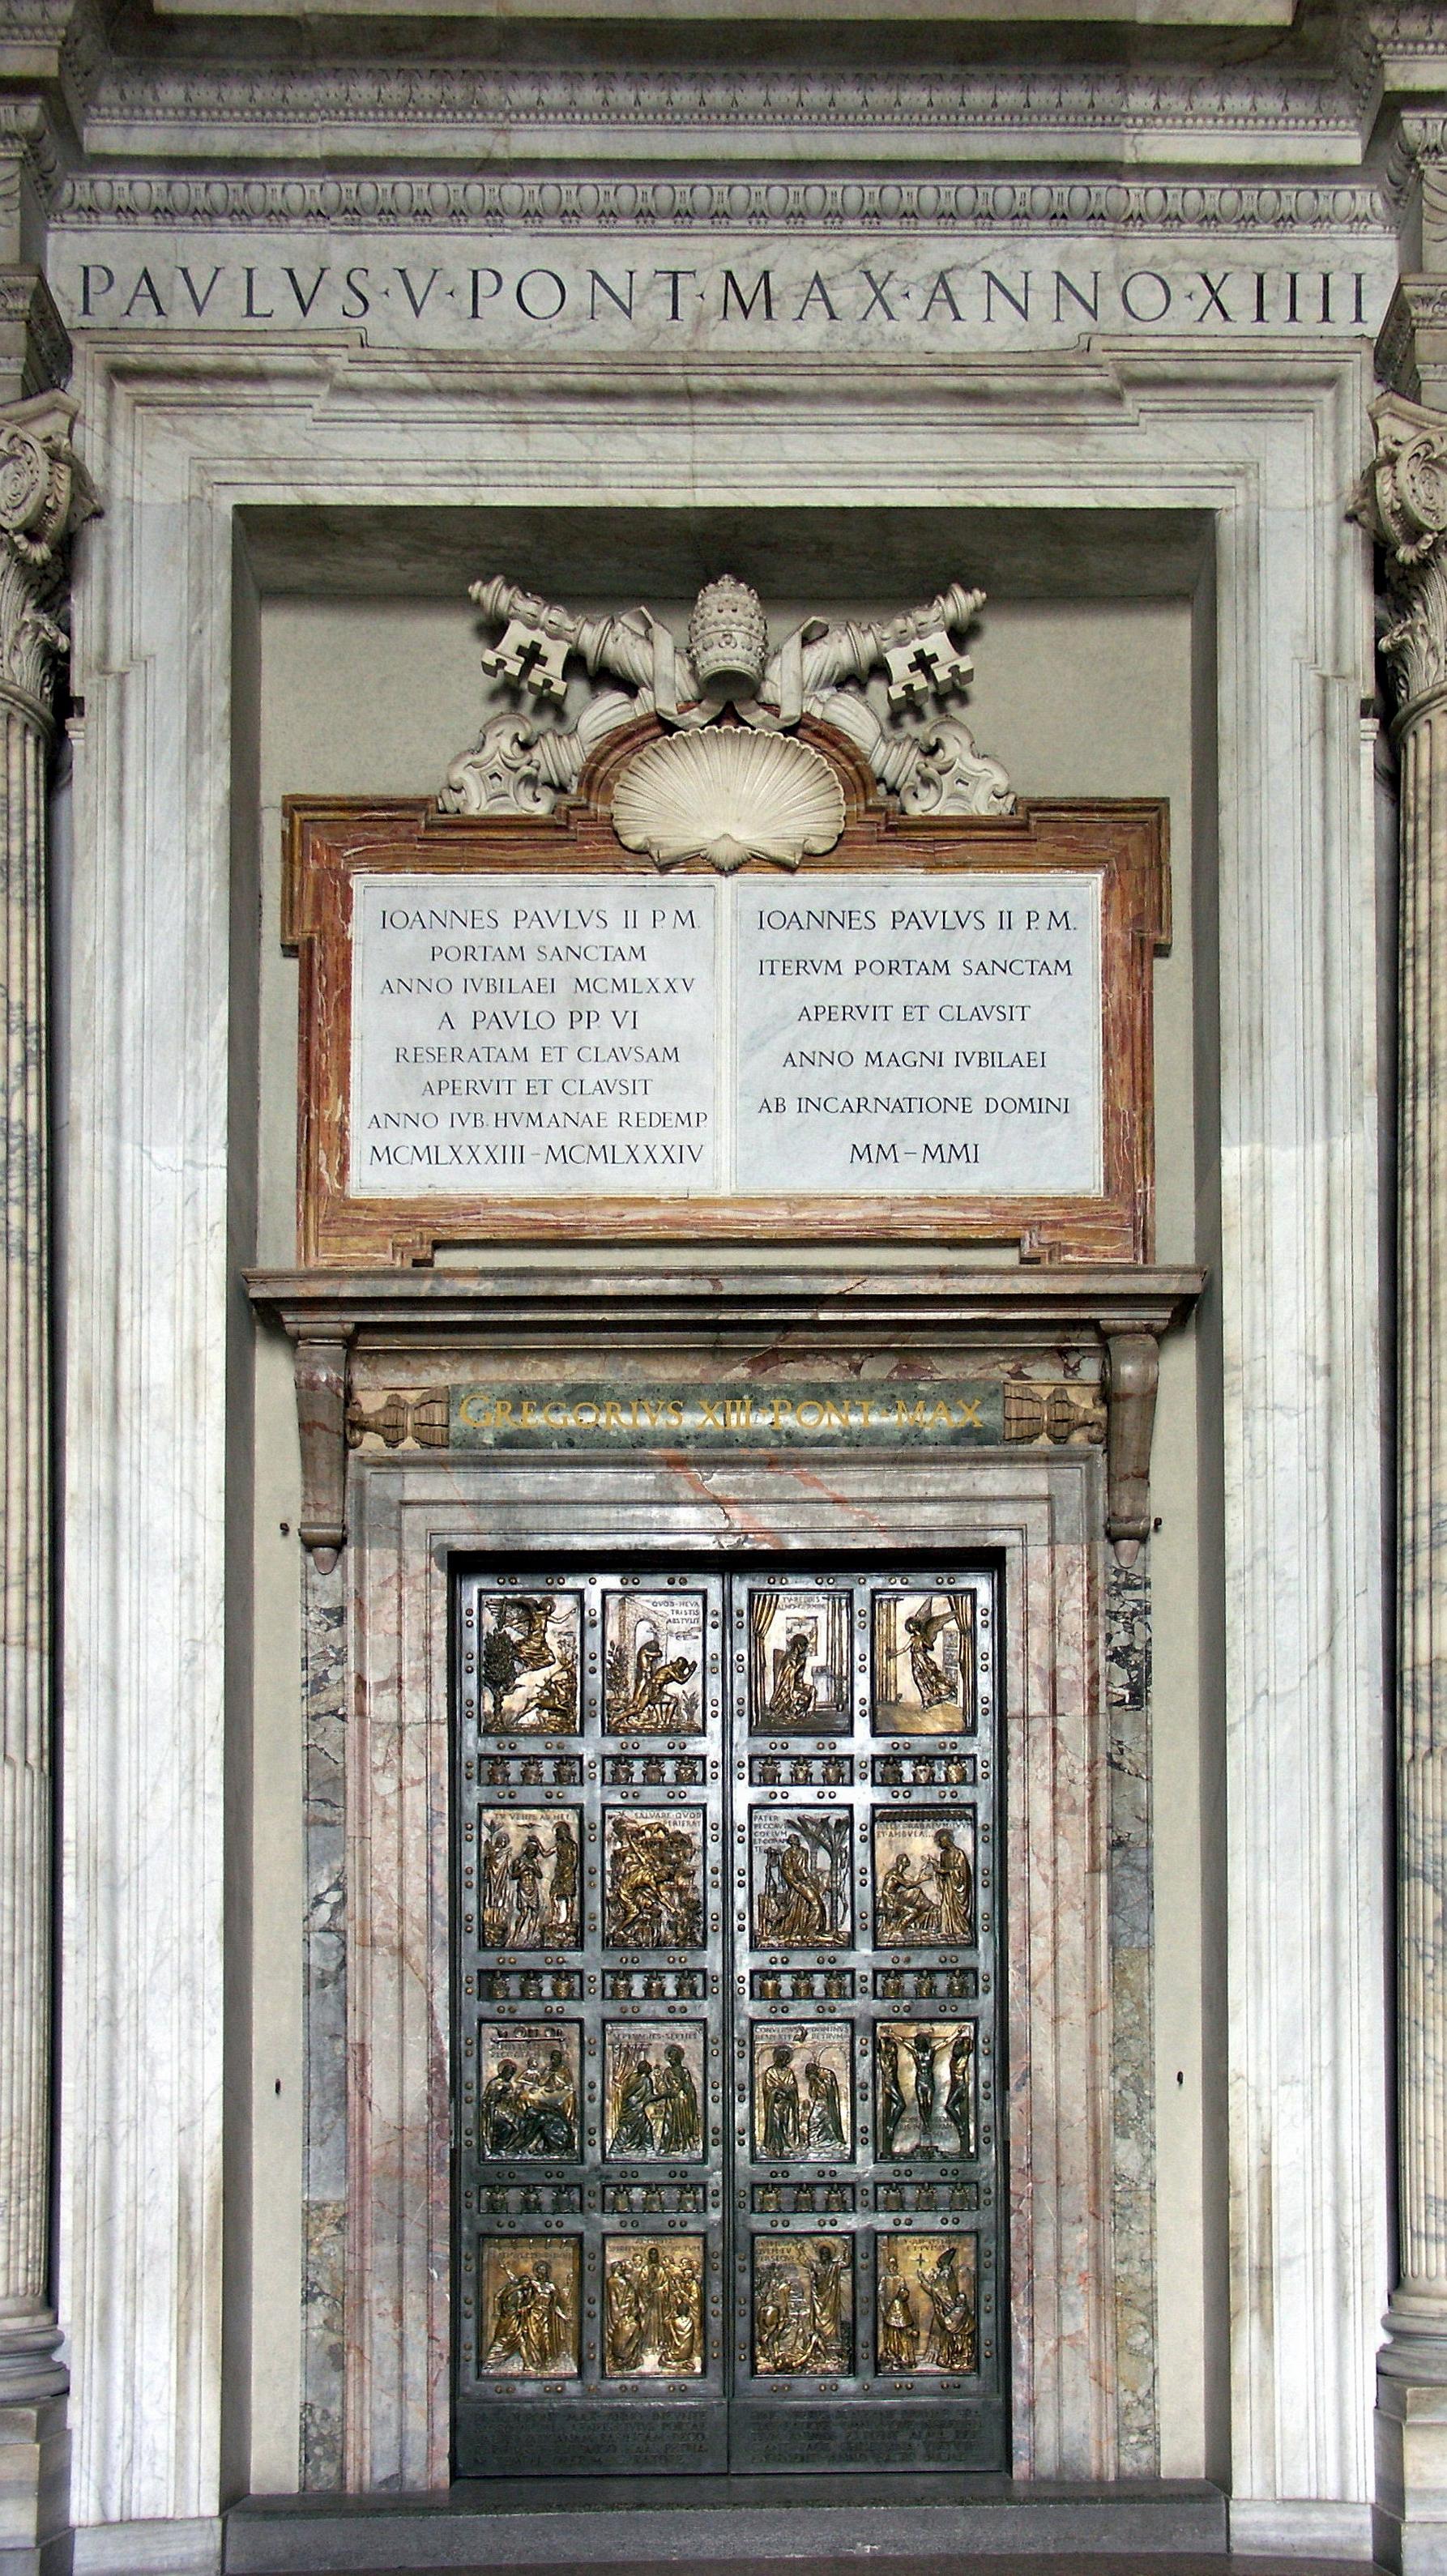 https://upload.wikimedia.org/wikipedia/commons/9/9d/Rom%2C_Vatikan%2C_Petersdom_-_Heilige_Pforte_1.jpg